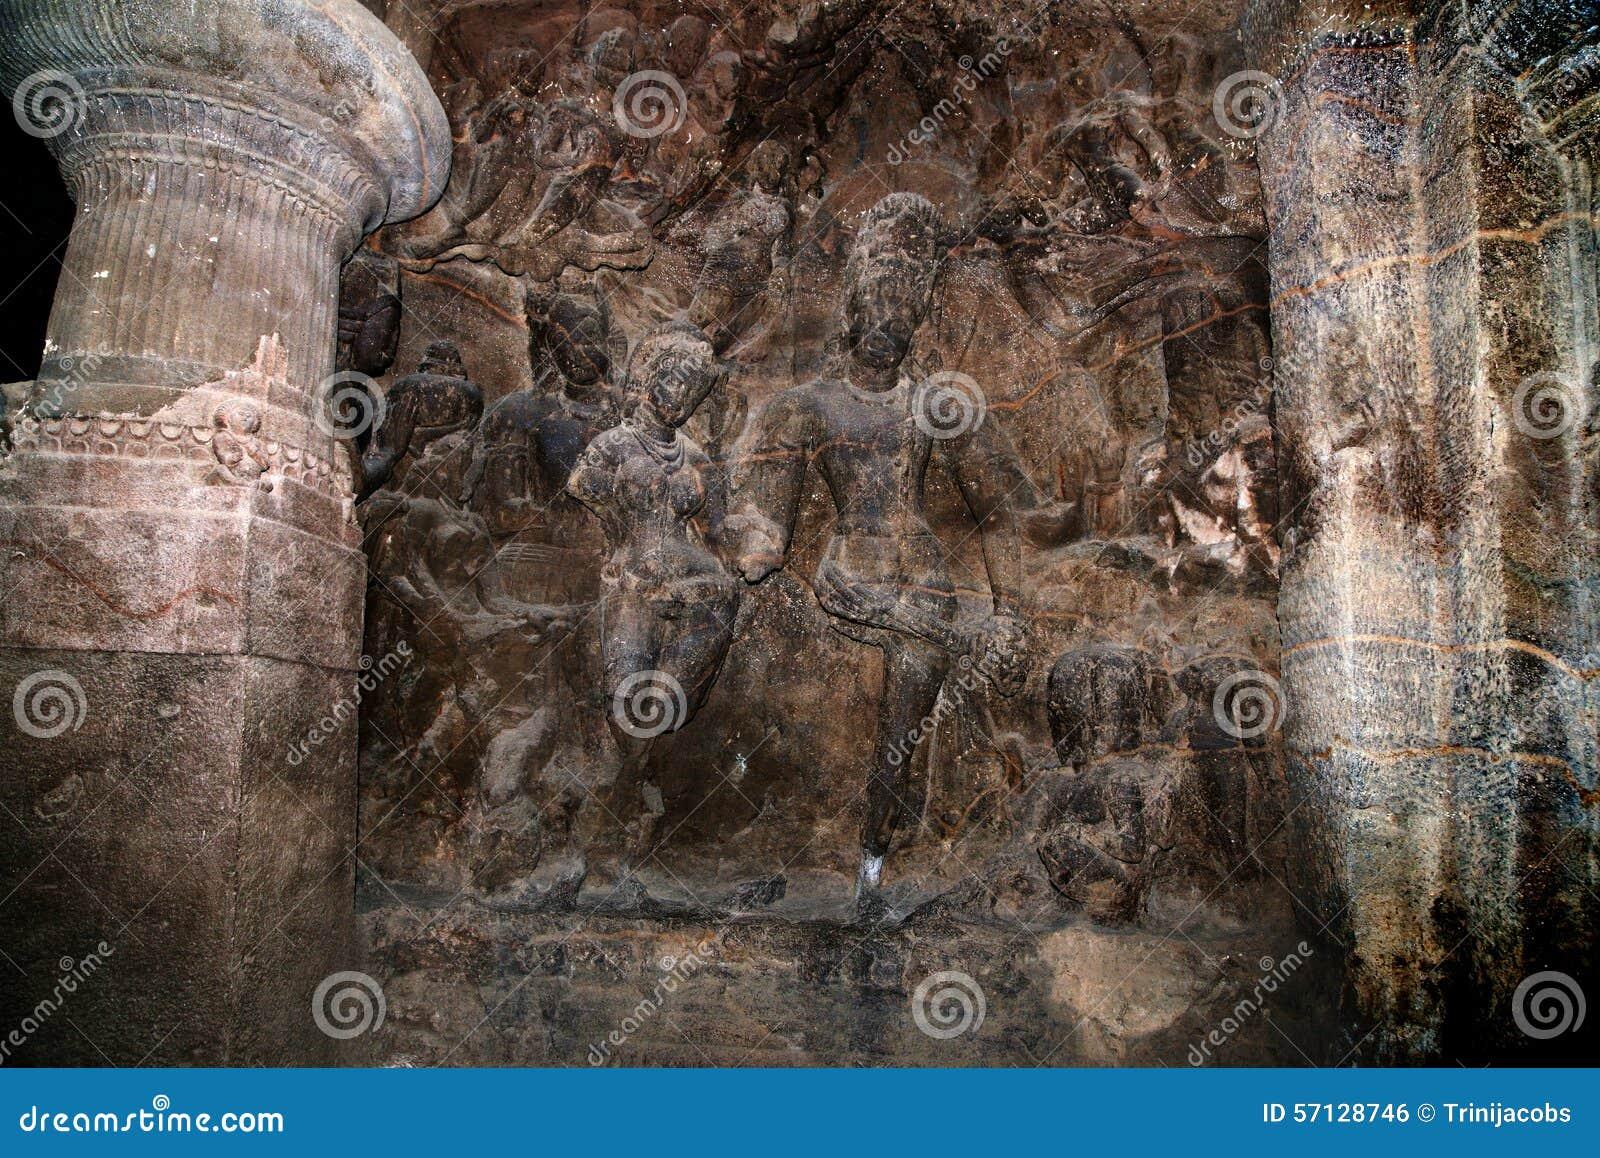 essays on elephanta the great cave of shiva Southern and southeastern asian art  or beyond the european tradition examples on essays on the ap exam  shiva as mahadeva, cave 1, elephanta.